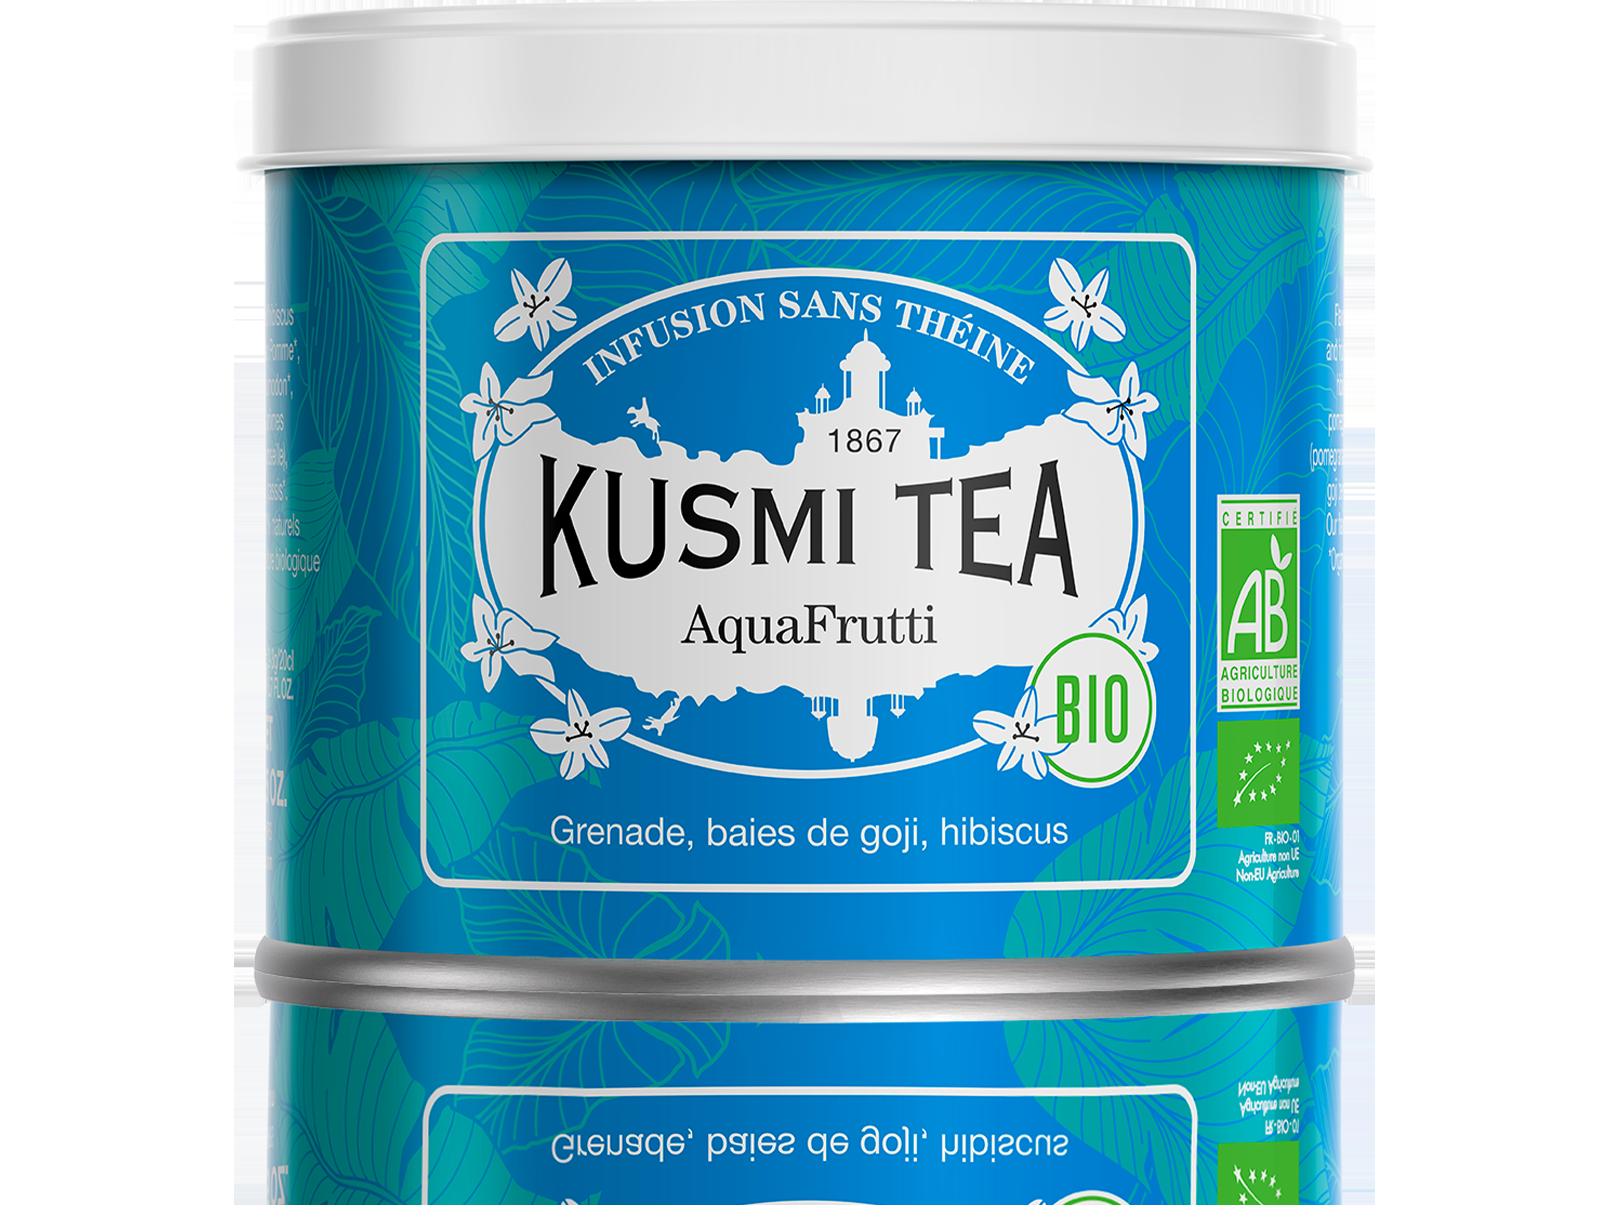 AquaFrutti (Infusion de fruits bio) - Kusmi Tea